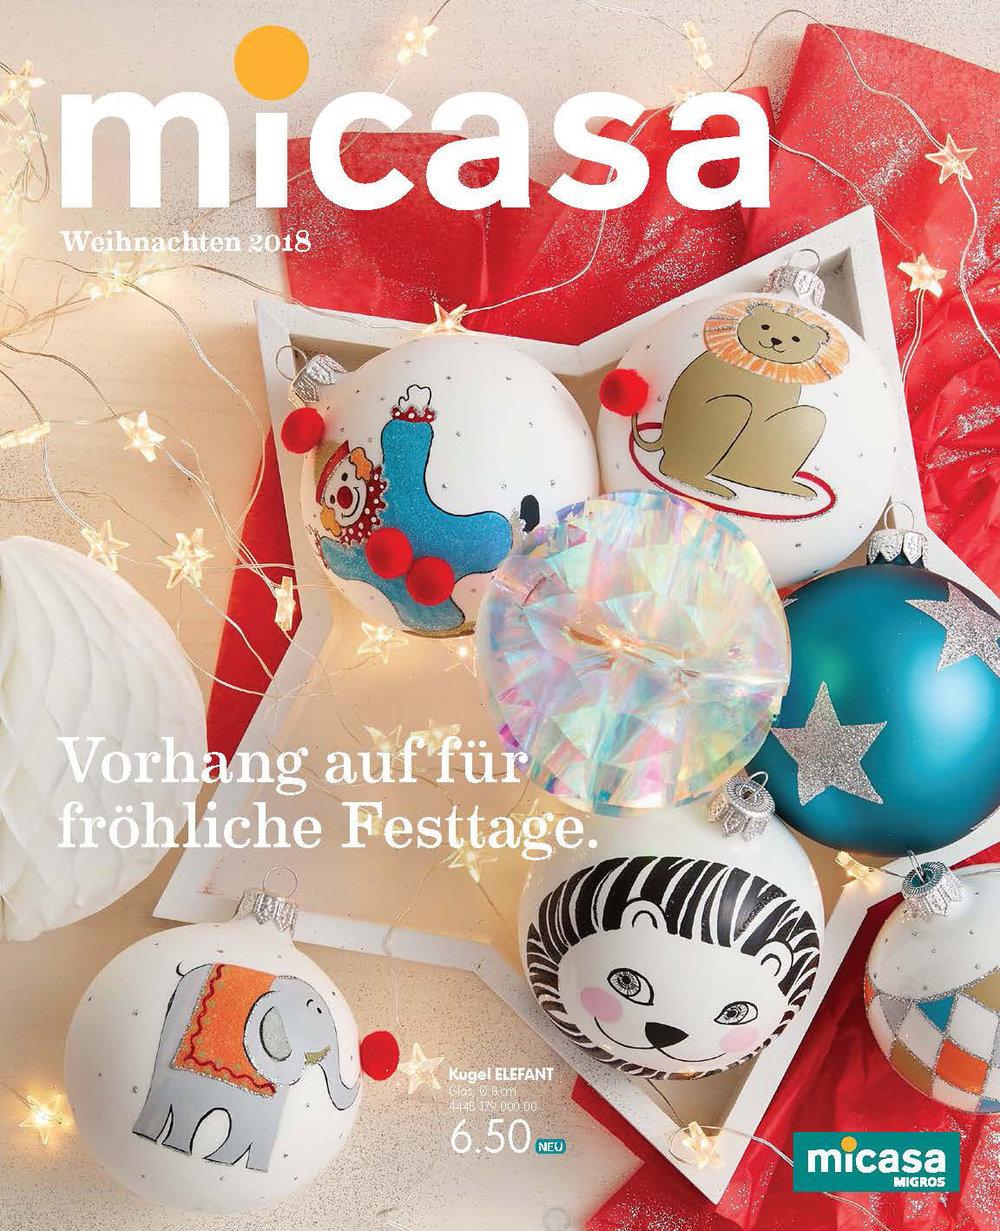 2019-02-08_micasa-xmas18-01.jpg